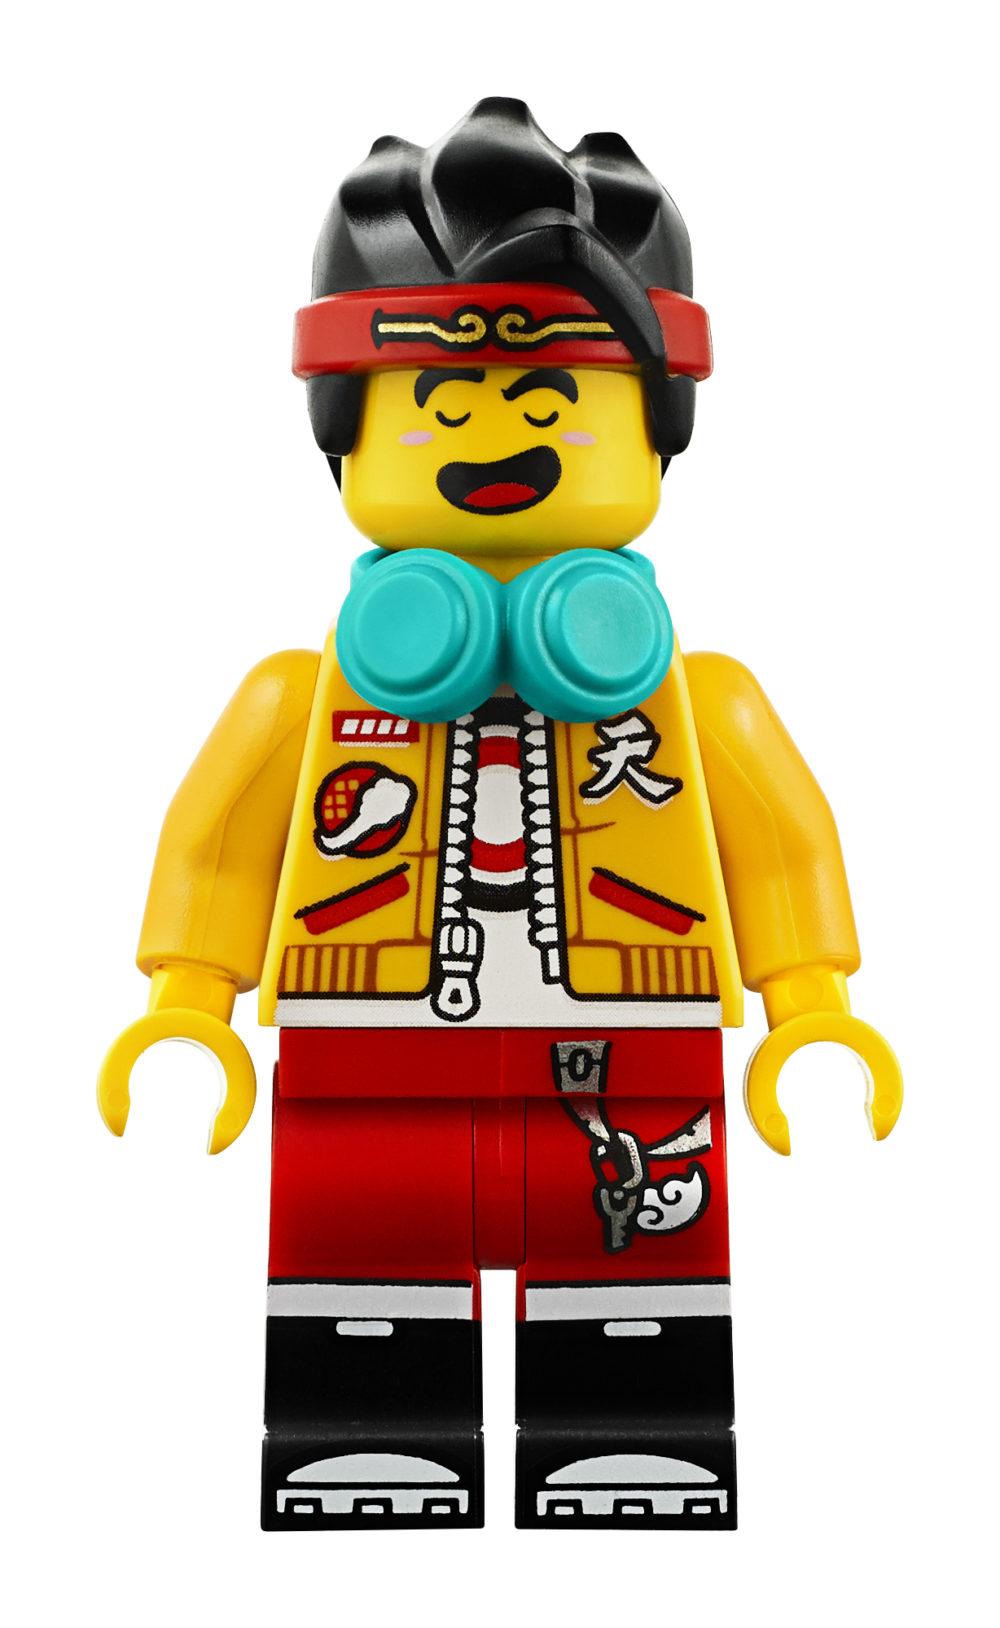 LEGO Monkie Kid Minifigure